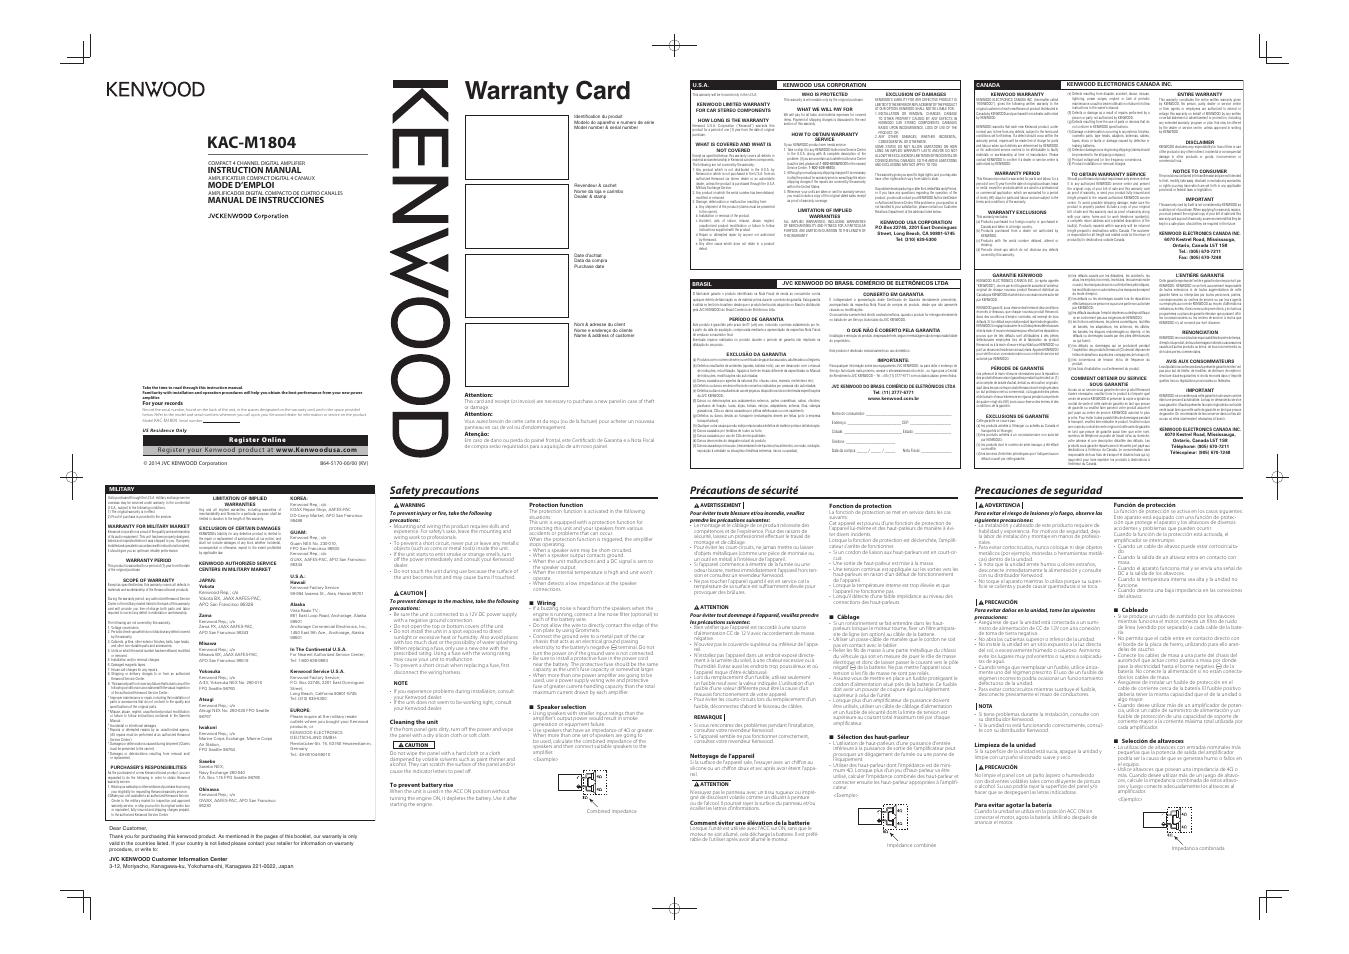 Kenwood Ddx6019 Wiring Diagram Fitfathersme excel project dashboard ...